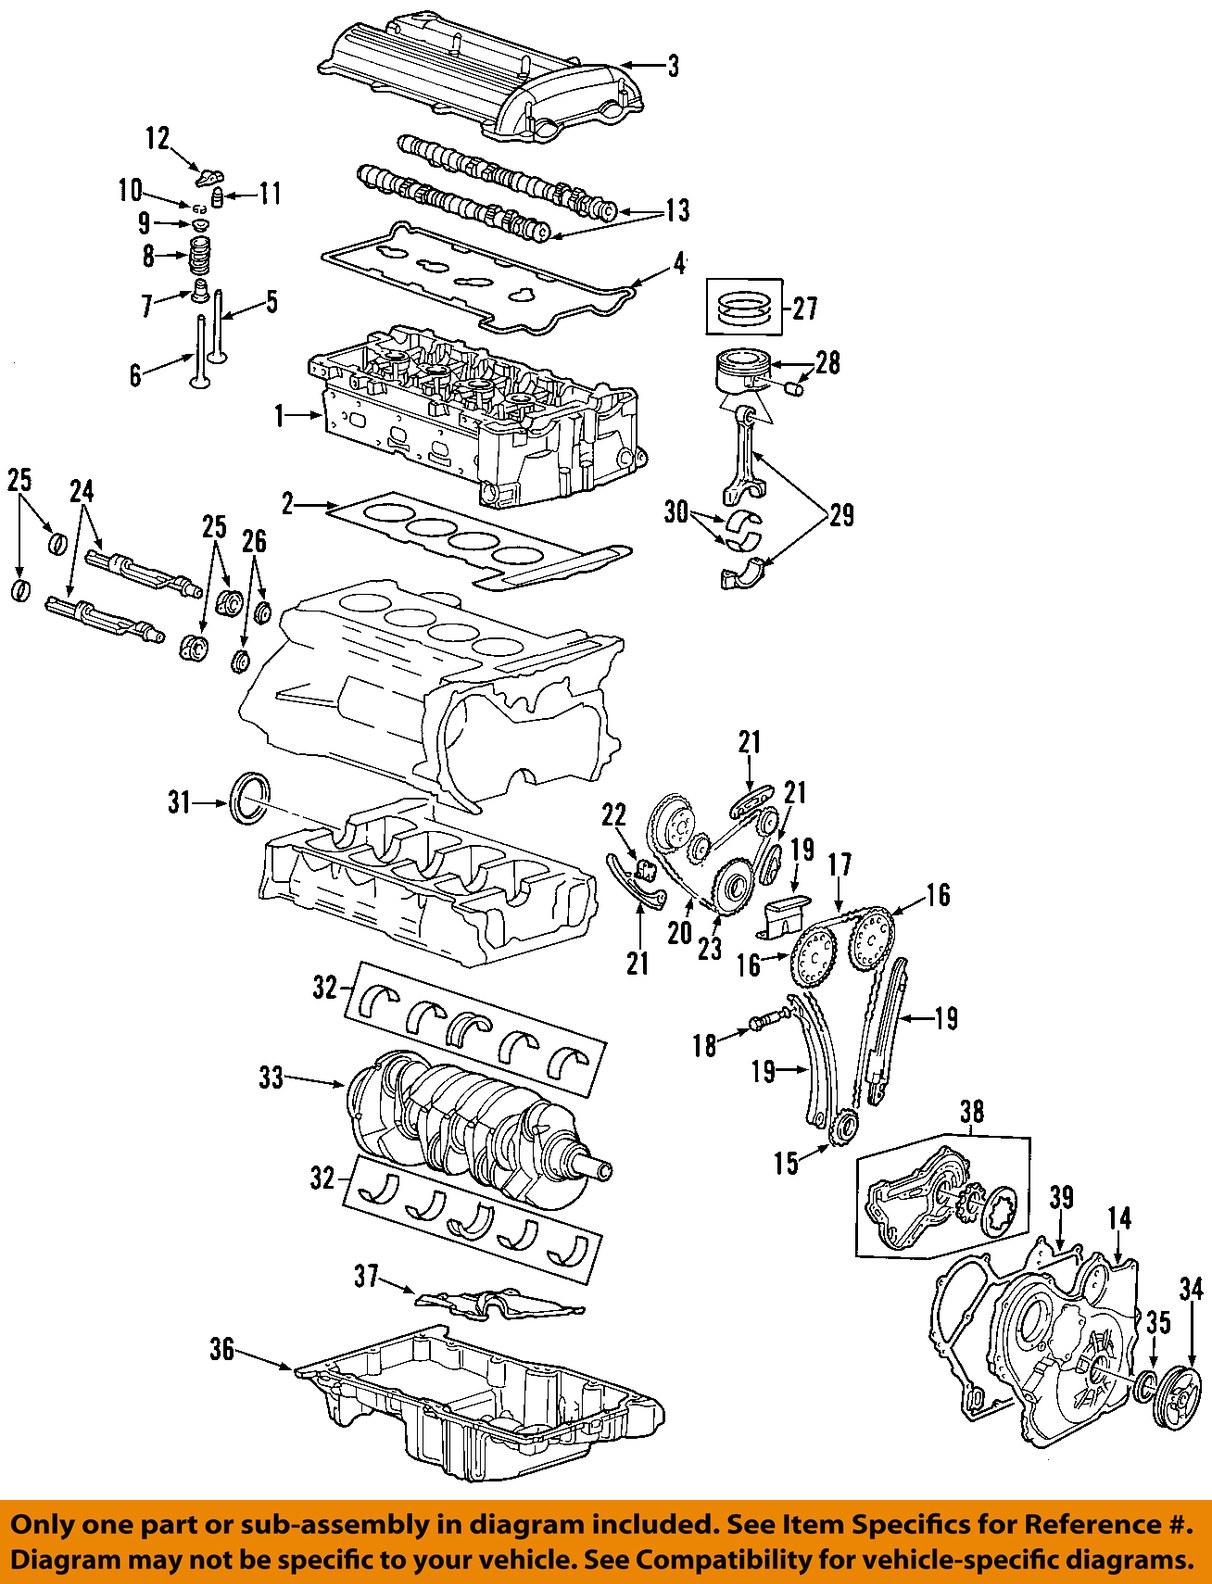 car truck parts parts accessories ebay motors rh goods cabinet top 2002 saturn l100 engine diagram 2002 saturn l300 engine diagram